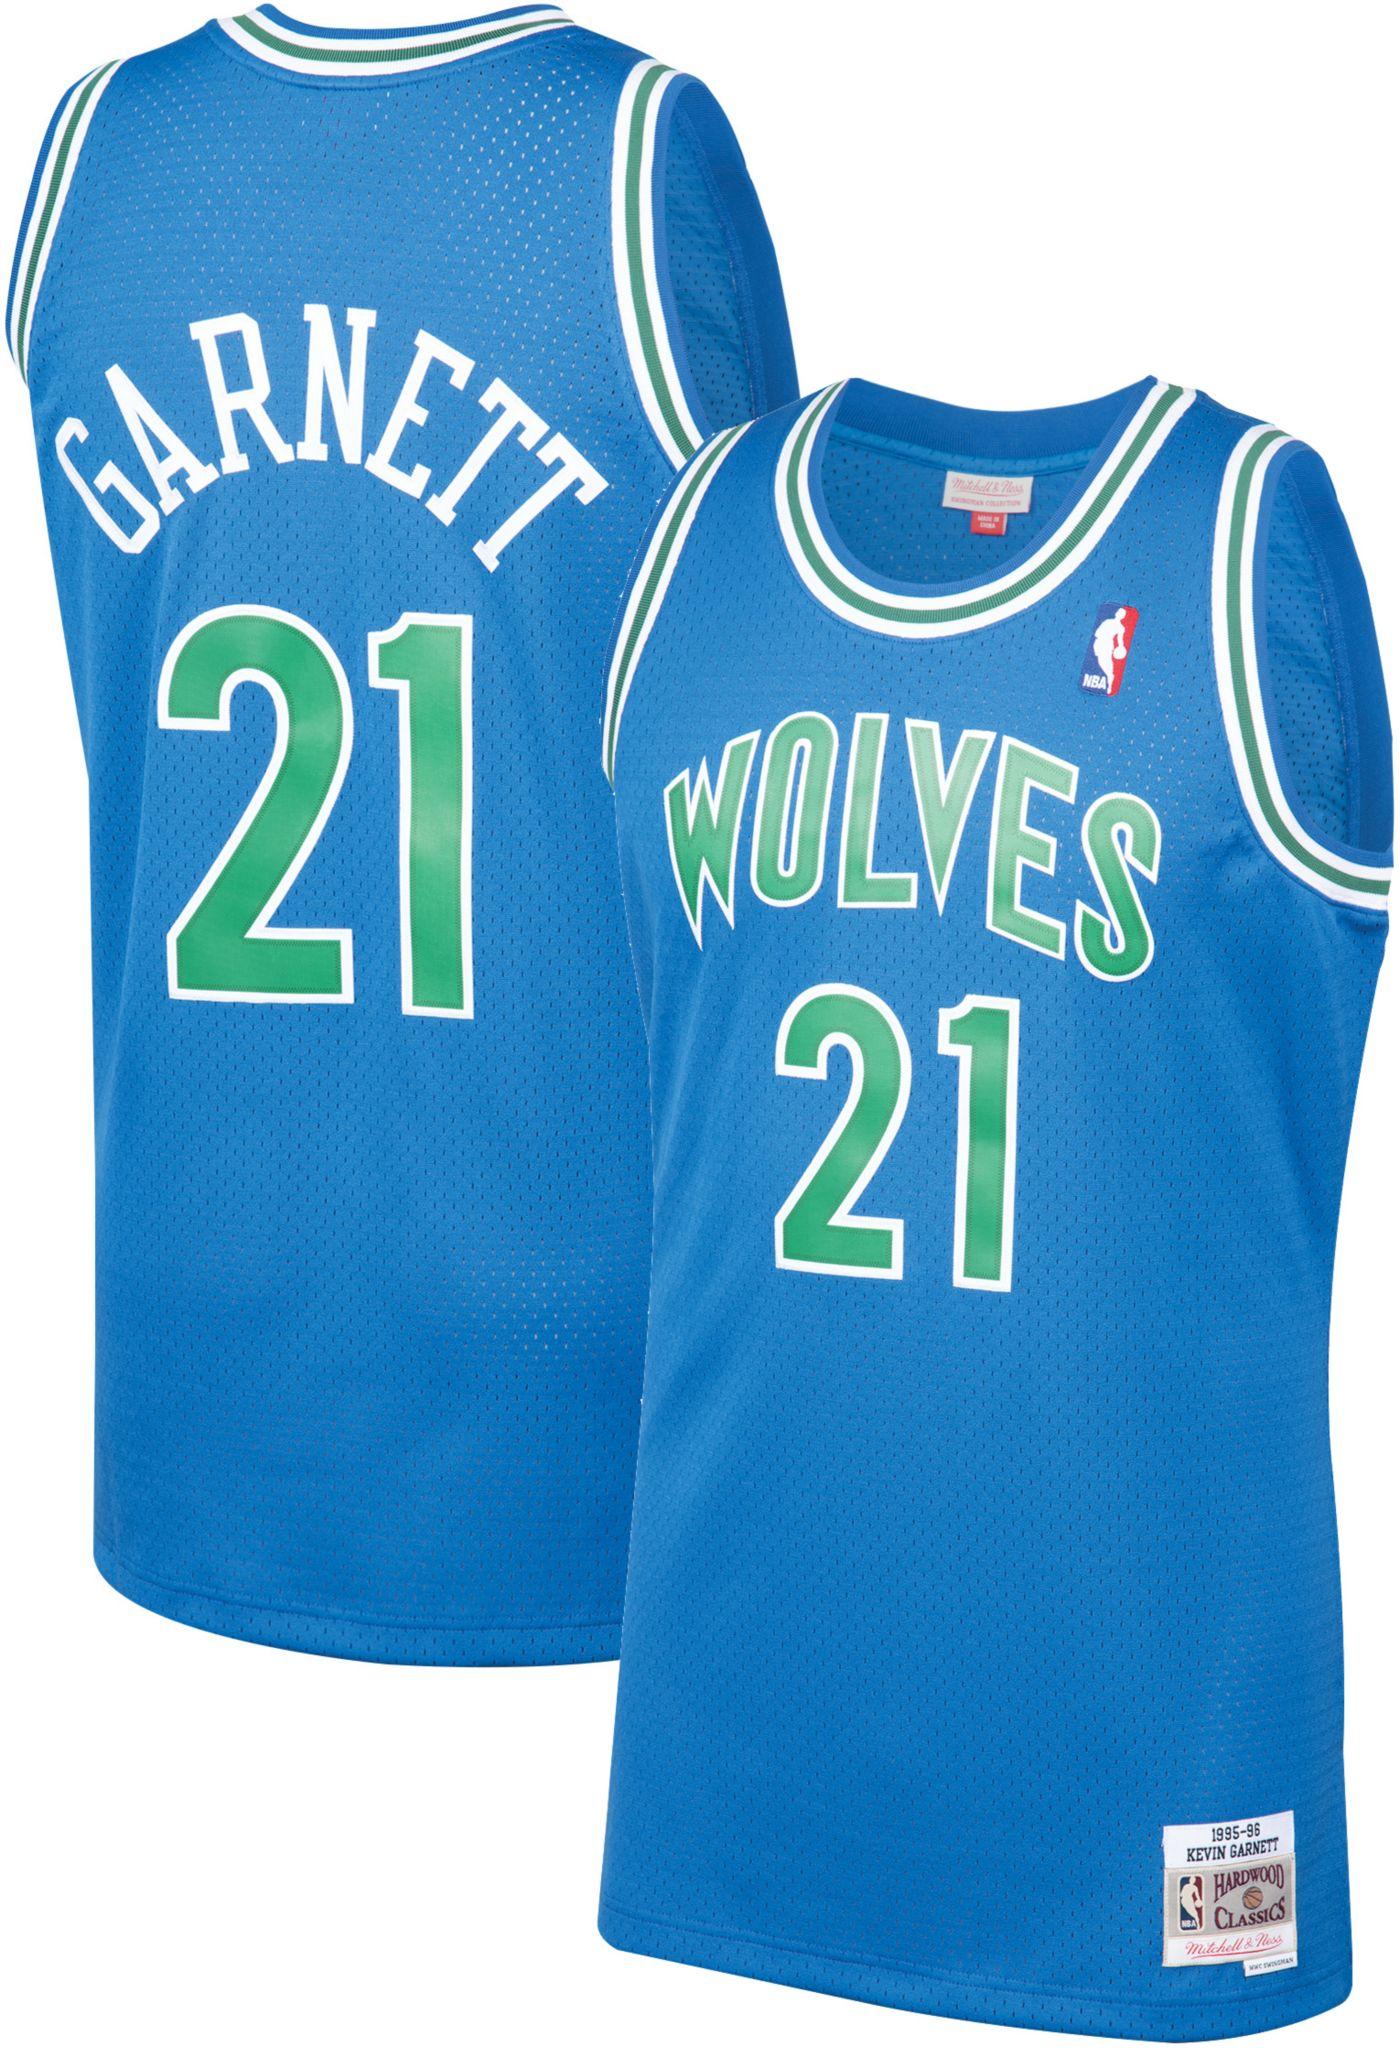 Mitchell & Ness Men's Minnesota Timberwolves Kevin Garnett #21 Swingman Jersey